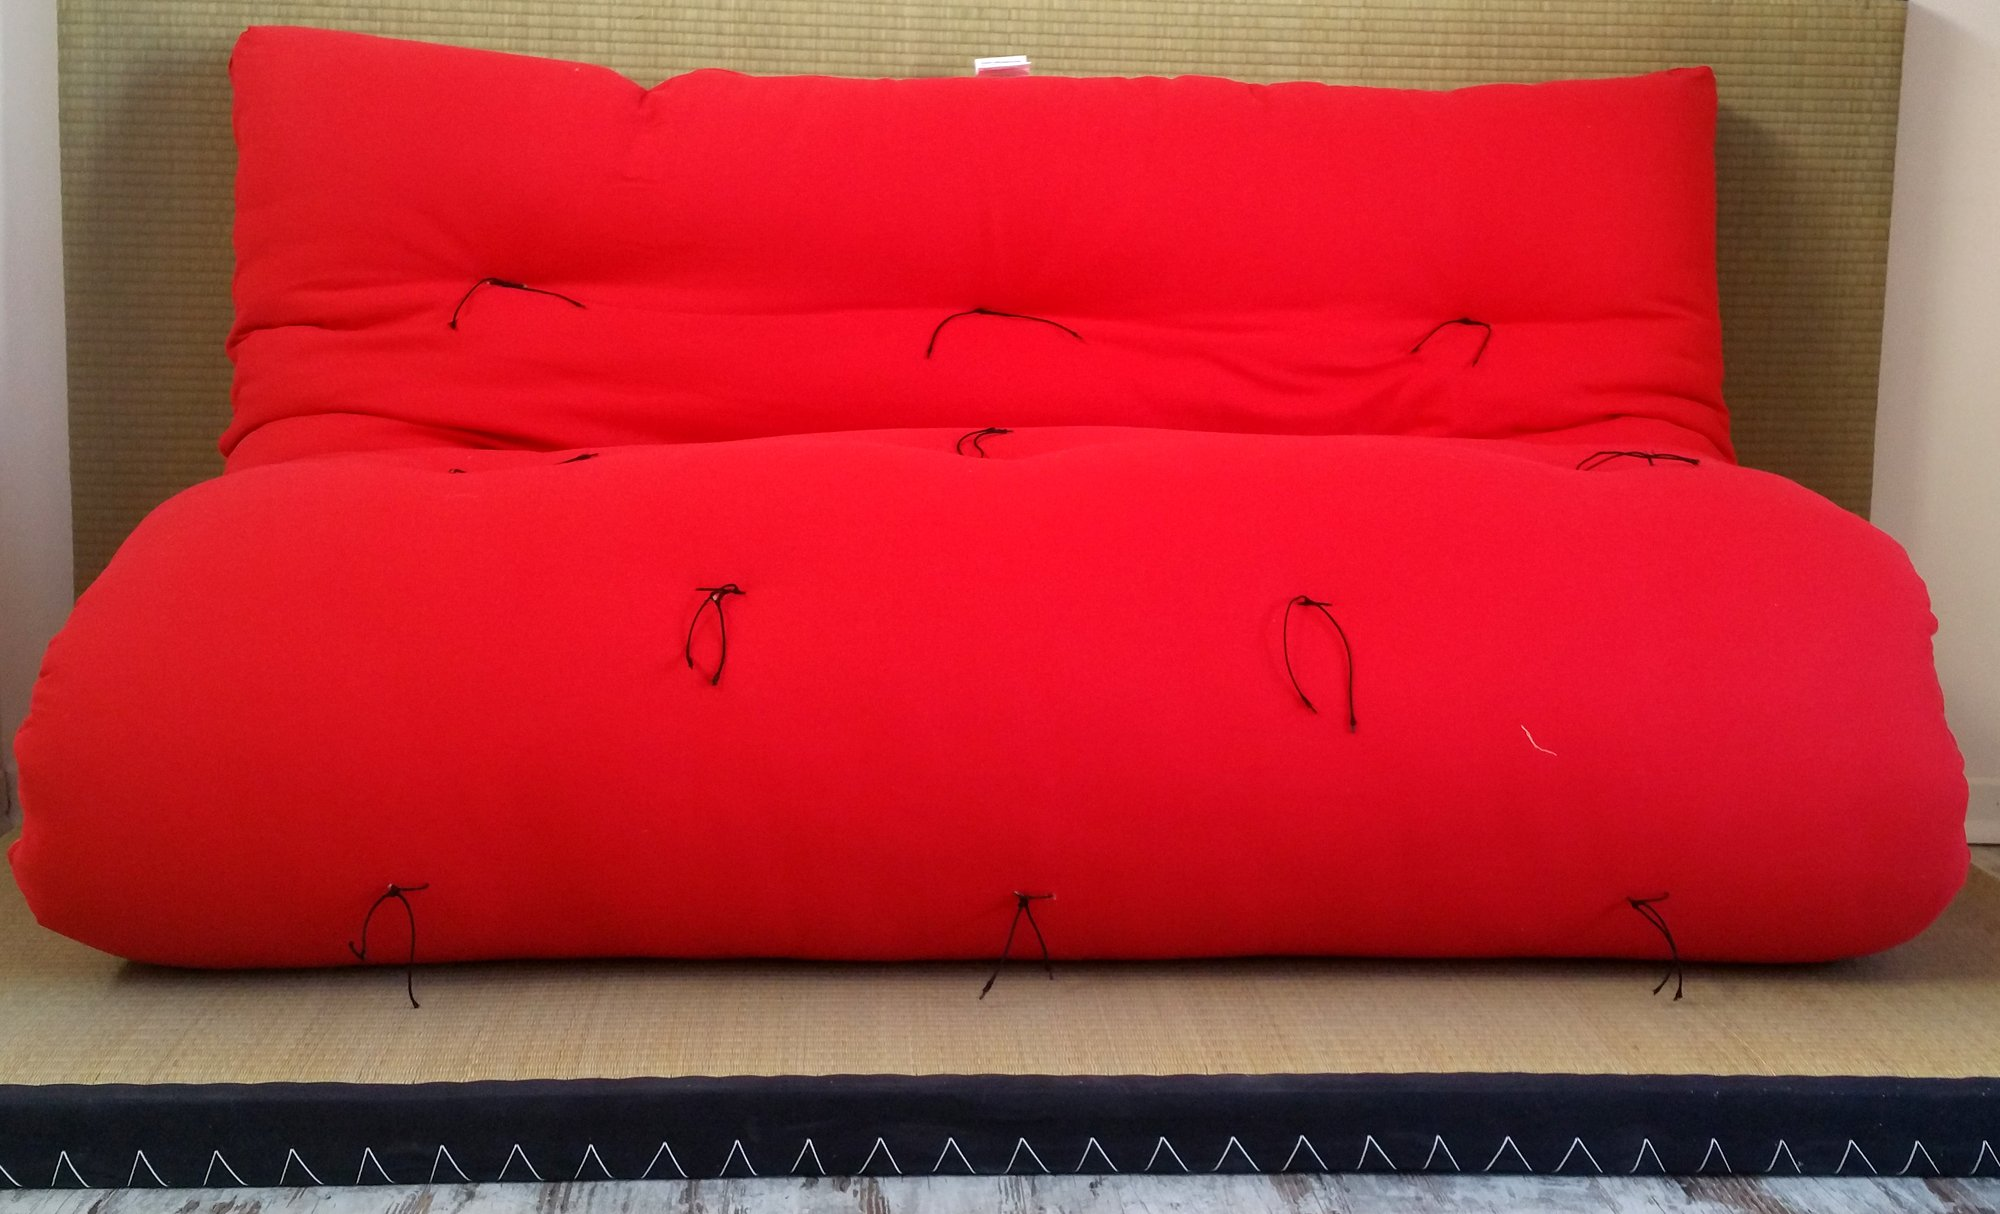 Sofá cama futón doble cara base tatami colores rojo/naranja medida futón 140 x 200 cm: Amazon.es: Hogar